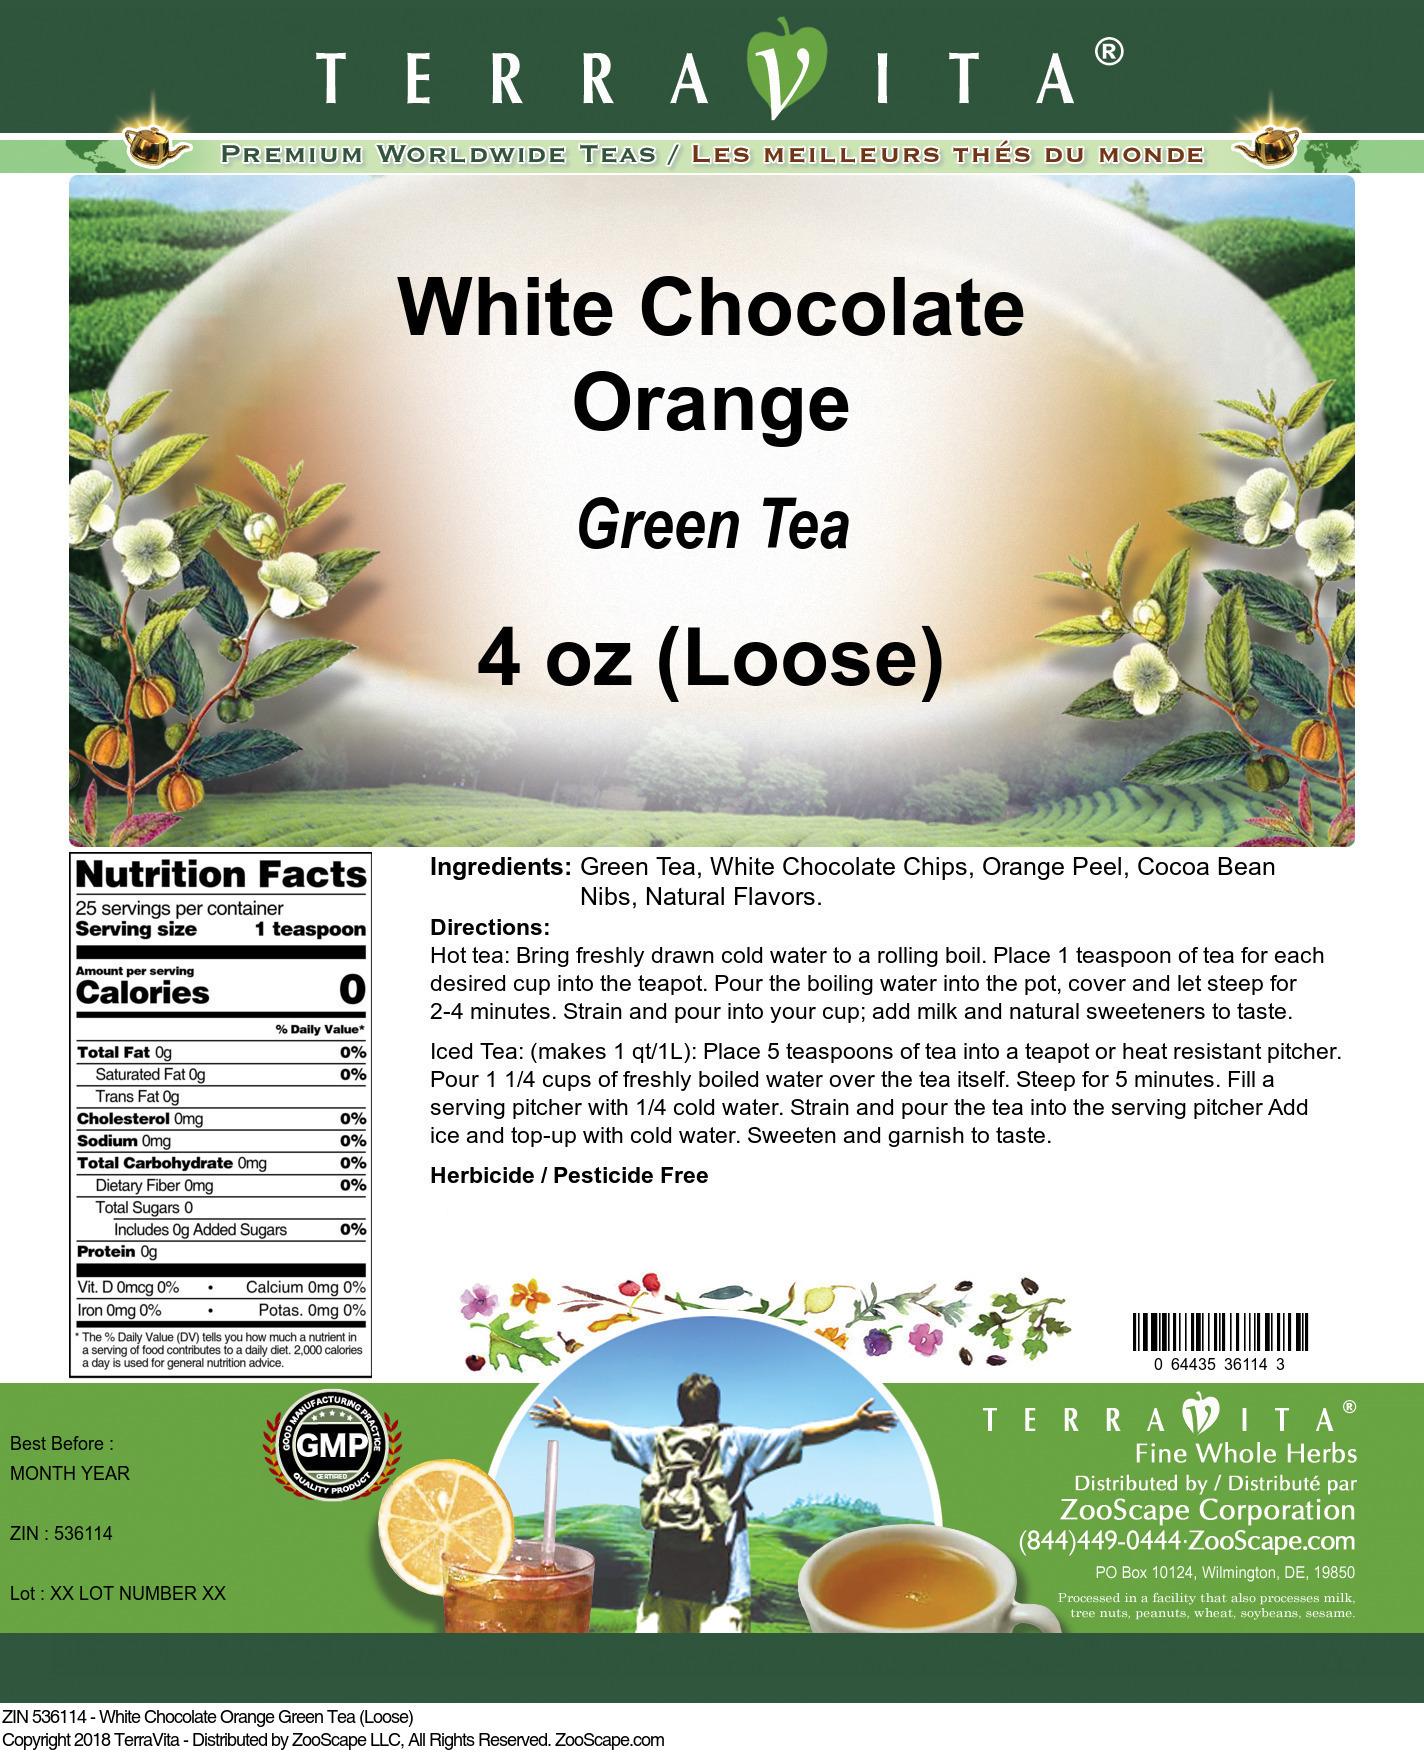 White Chocolate Orange Green Tea (Loose)